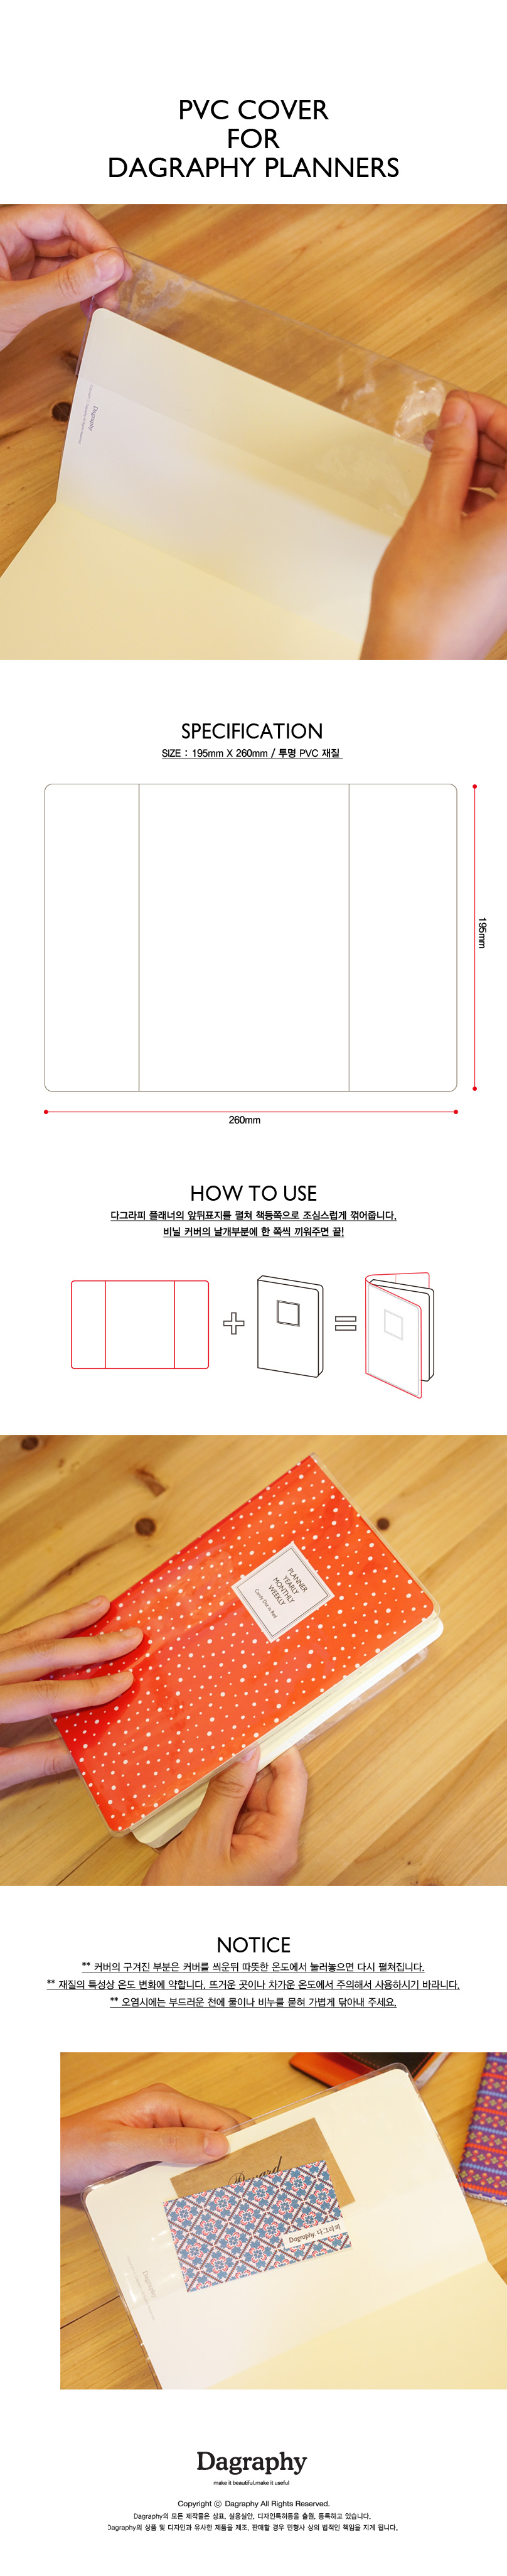 Planner PVC Cover - 다그라피, 1,500원, 다이어리액세서리, 커버